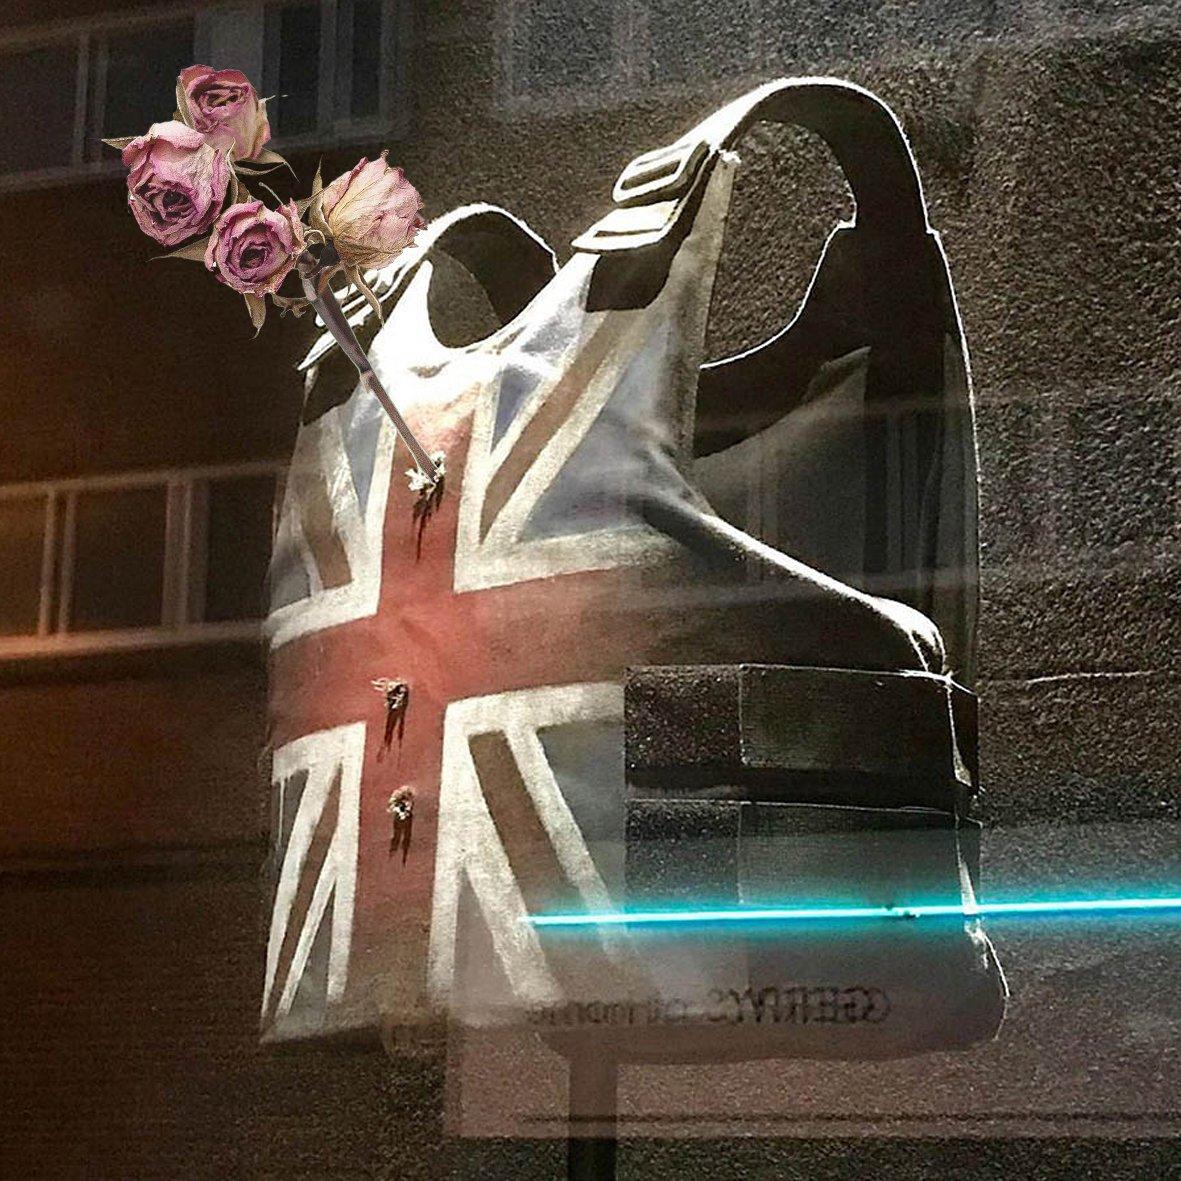 Hommage #banksy × #flowers  #japan #graphics #design #art #fashion #streetfashion #skateboard  #photoshop #graphicsdesign  #photo #collage #collageart #sneakers #japaneseart #highbrand  #domesticbrand #skater #digitalcollage #digitalcollageart #music